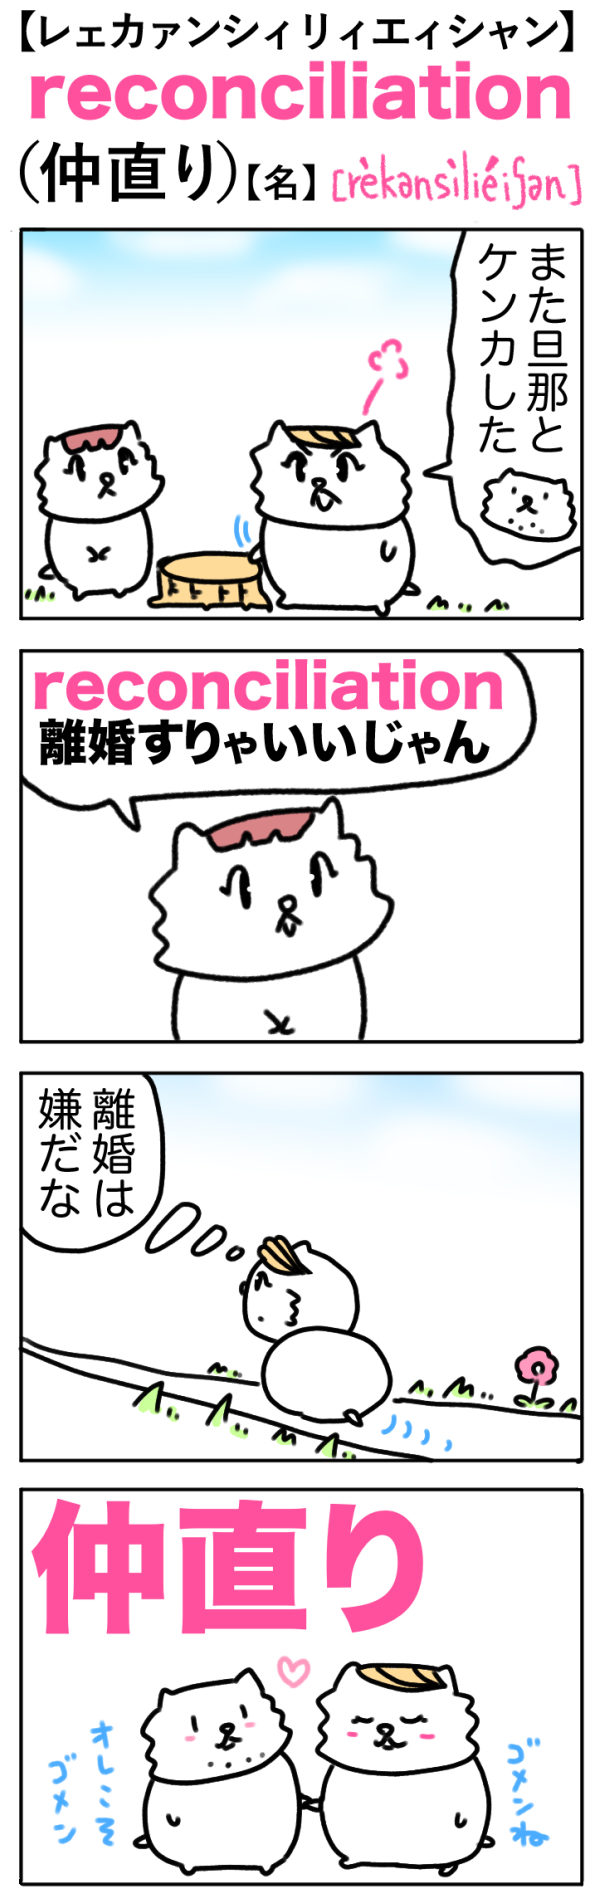 reconciliation(仲直り)の語呂合わせ英単語